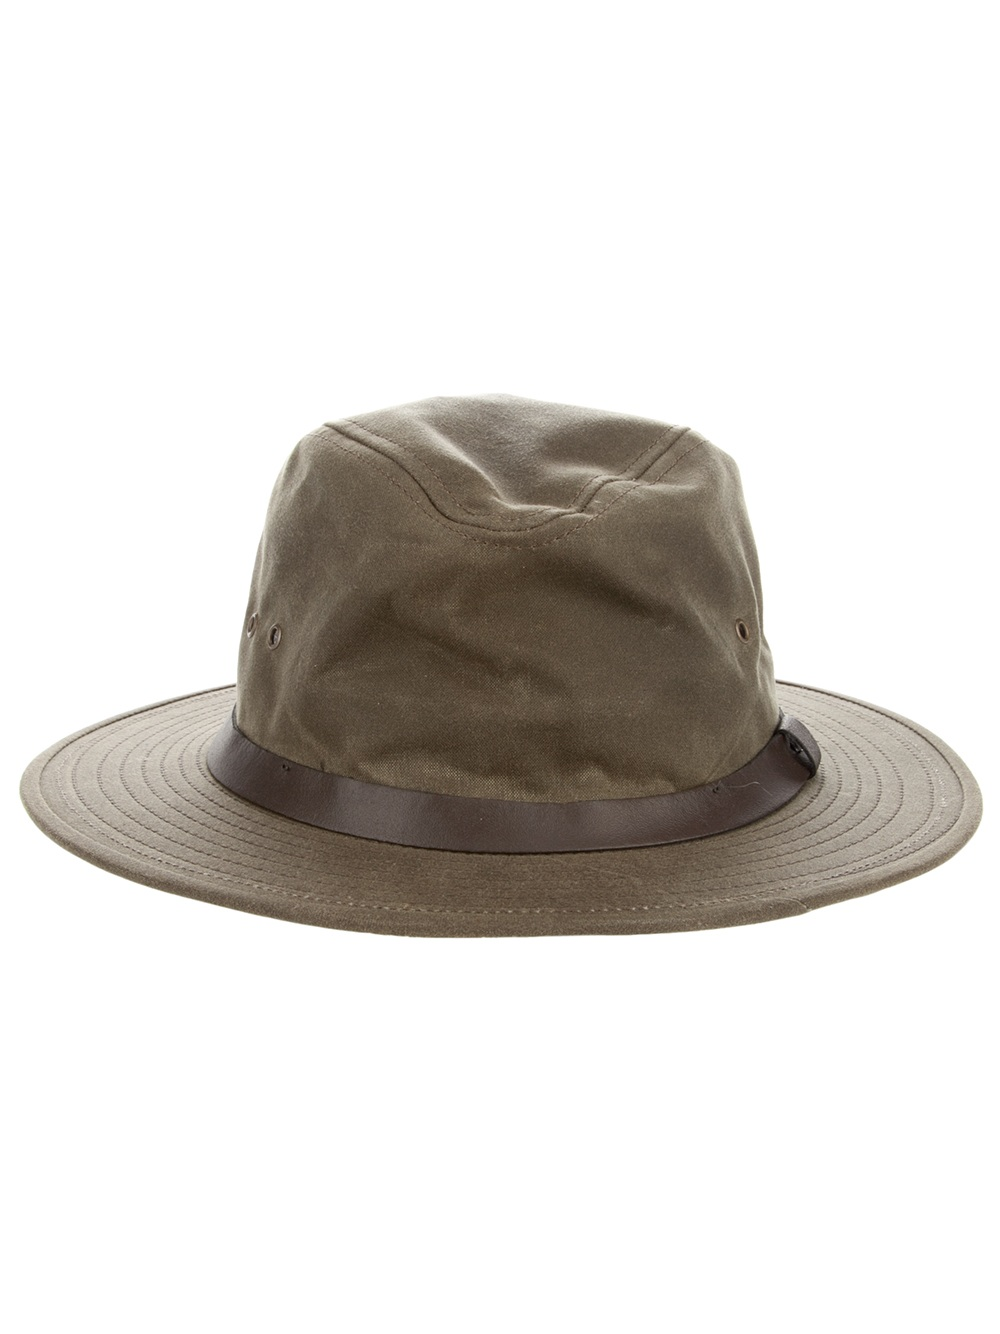 Filson Bucket Hat In Natural For Men Khaki Lyst